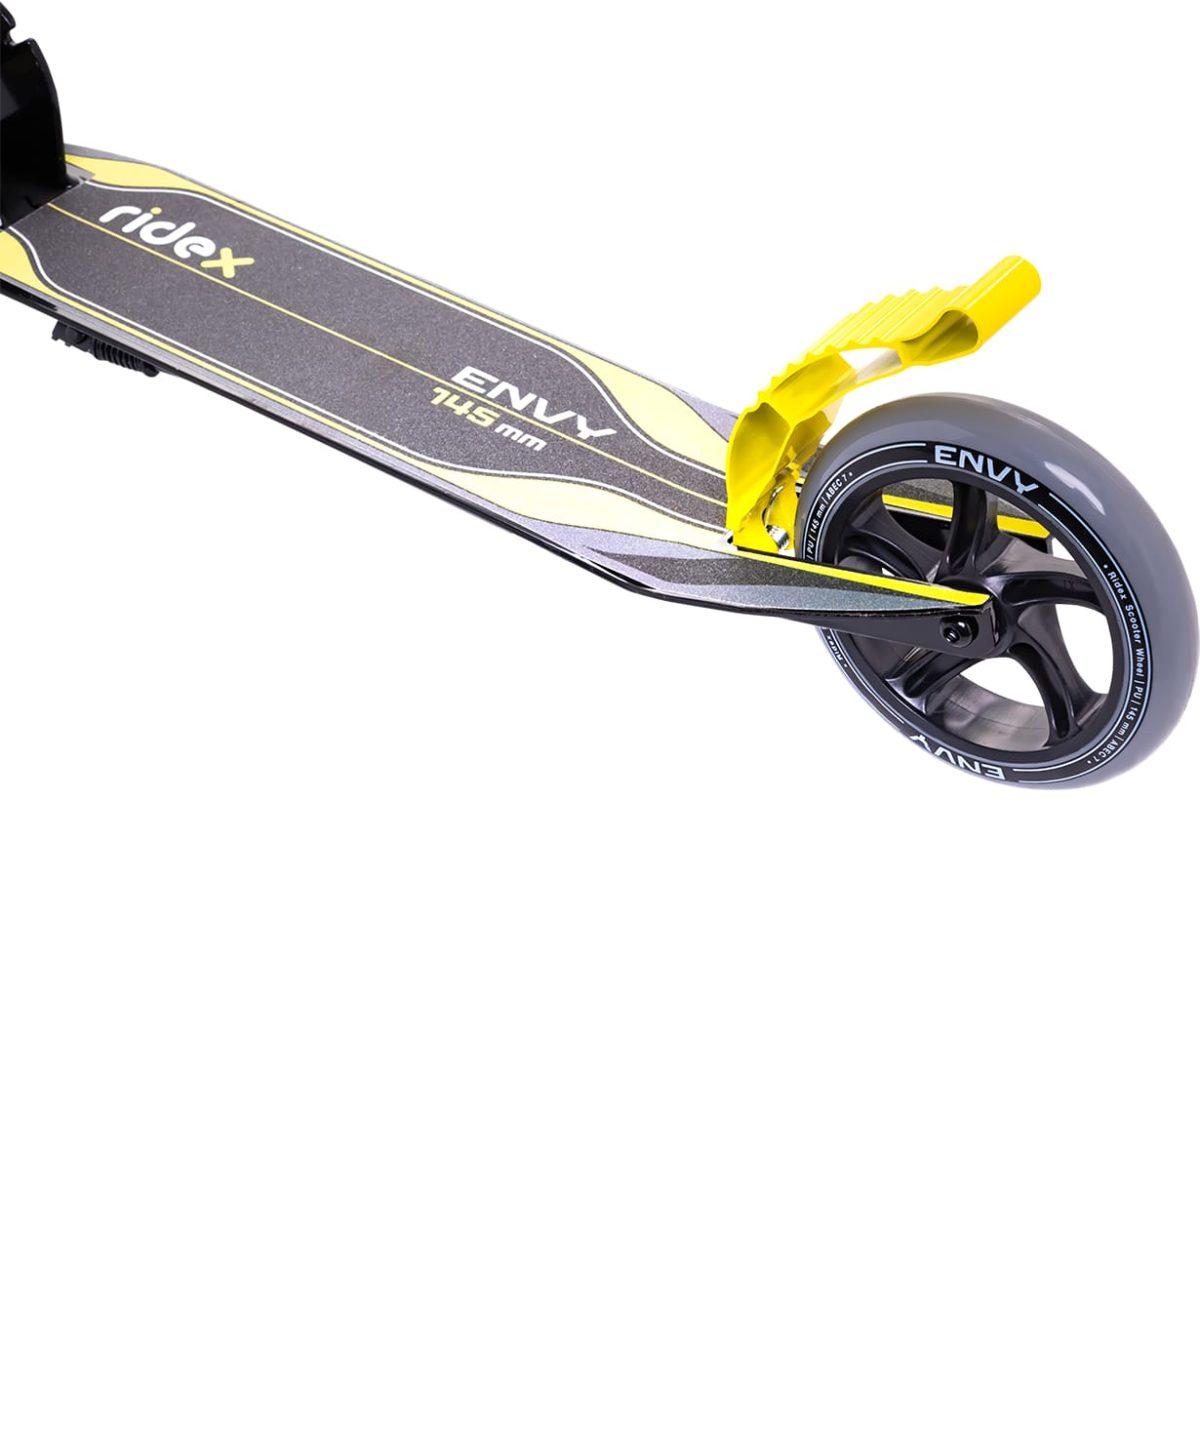 RIDEX Envy Самокат 2-колесный  145 мм  Envy: жёлтый - 4